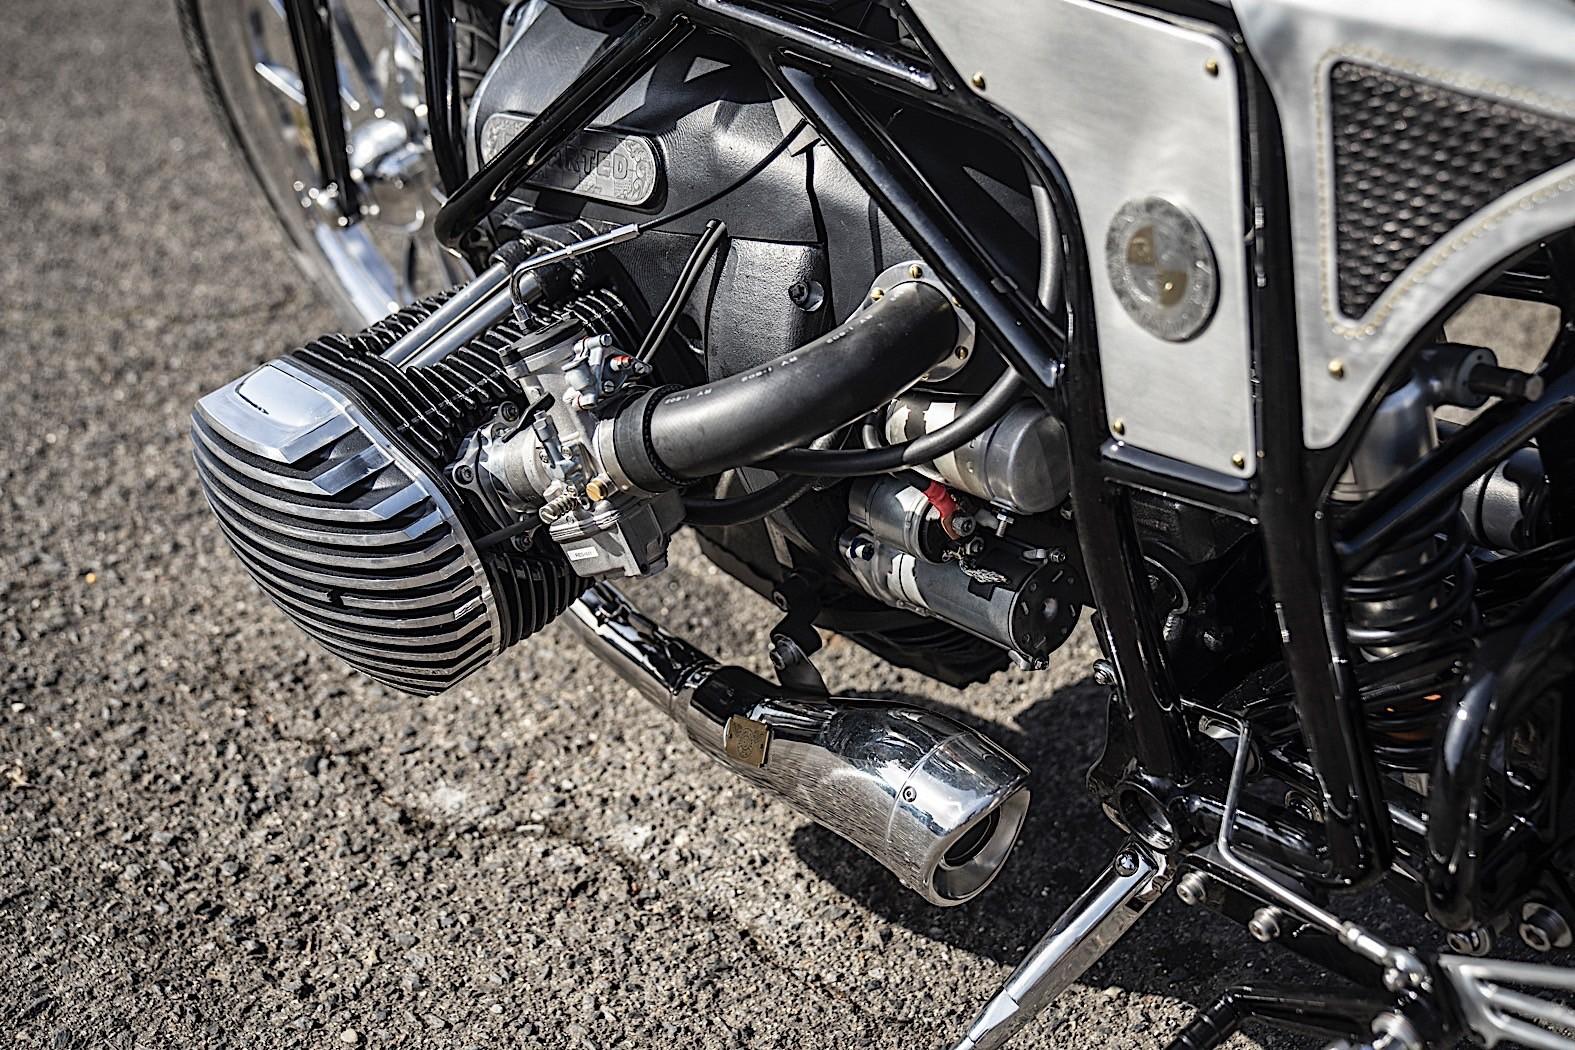 Brand New BMW Motorrad Boxer Engine Shown on Custom Works